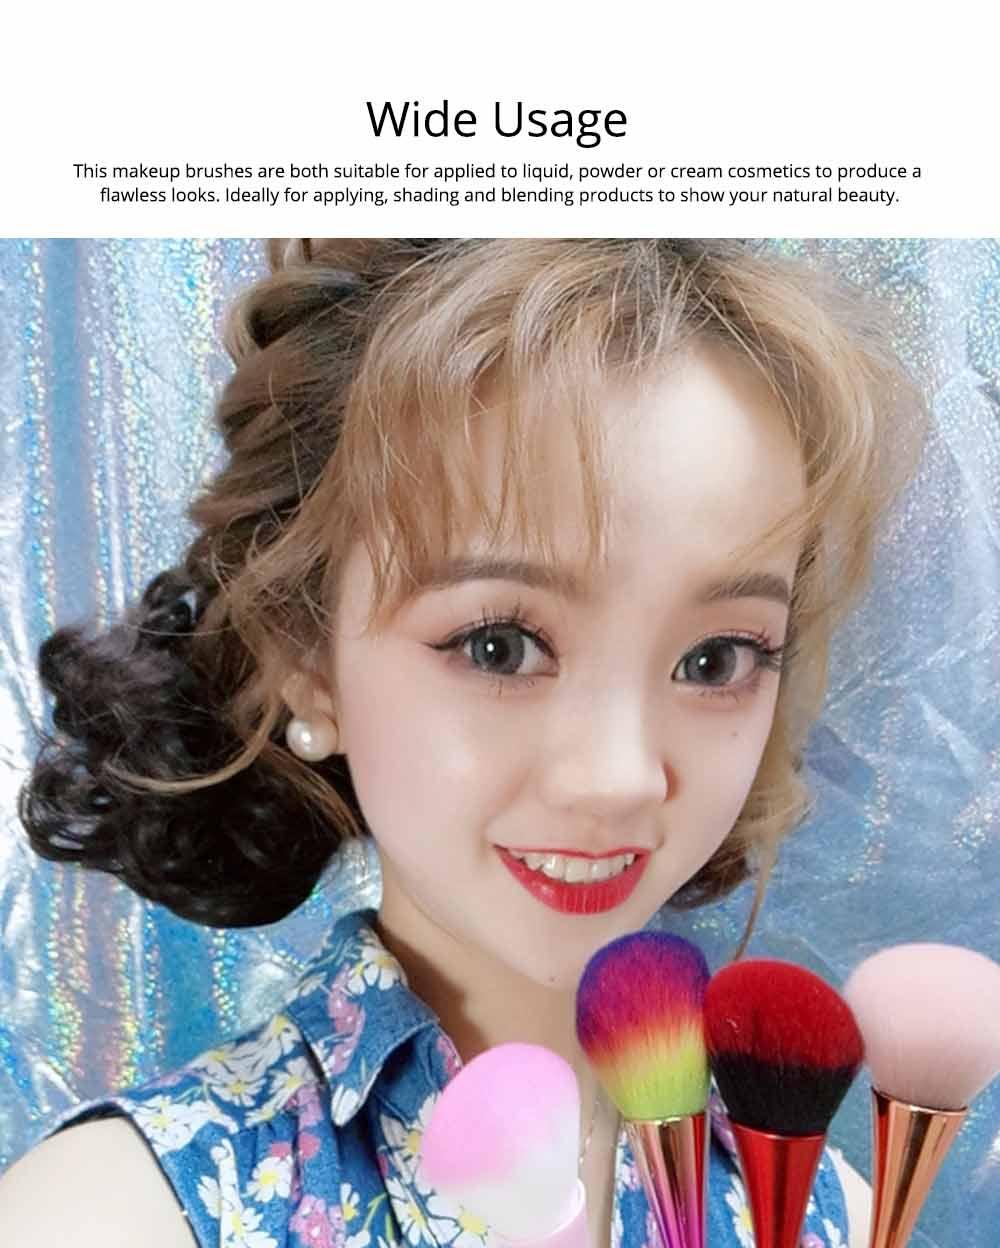 Multifunctional Makeup Brush with Small Pretty Waist, Beauty Makeup Blush Powder Painting as Powder Paint and Blush Brush 6